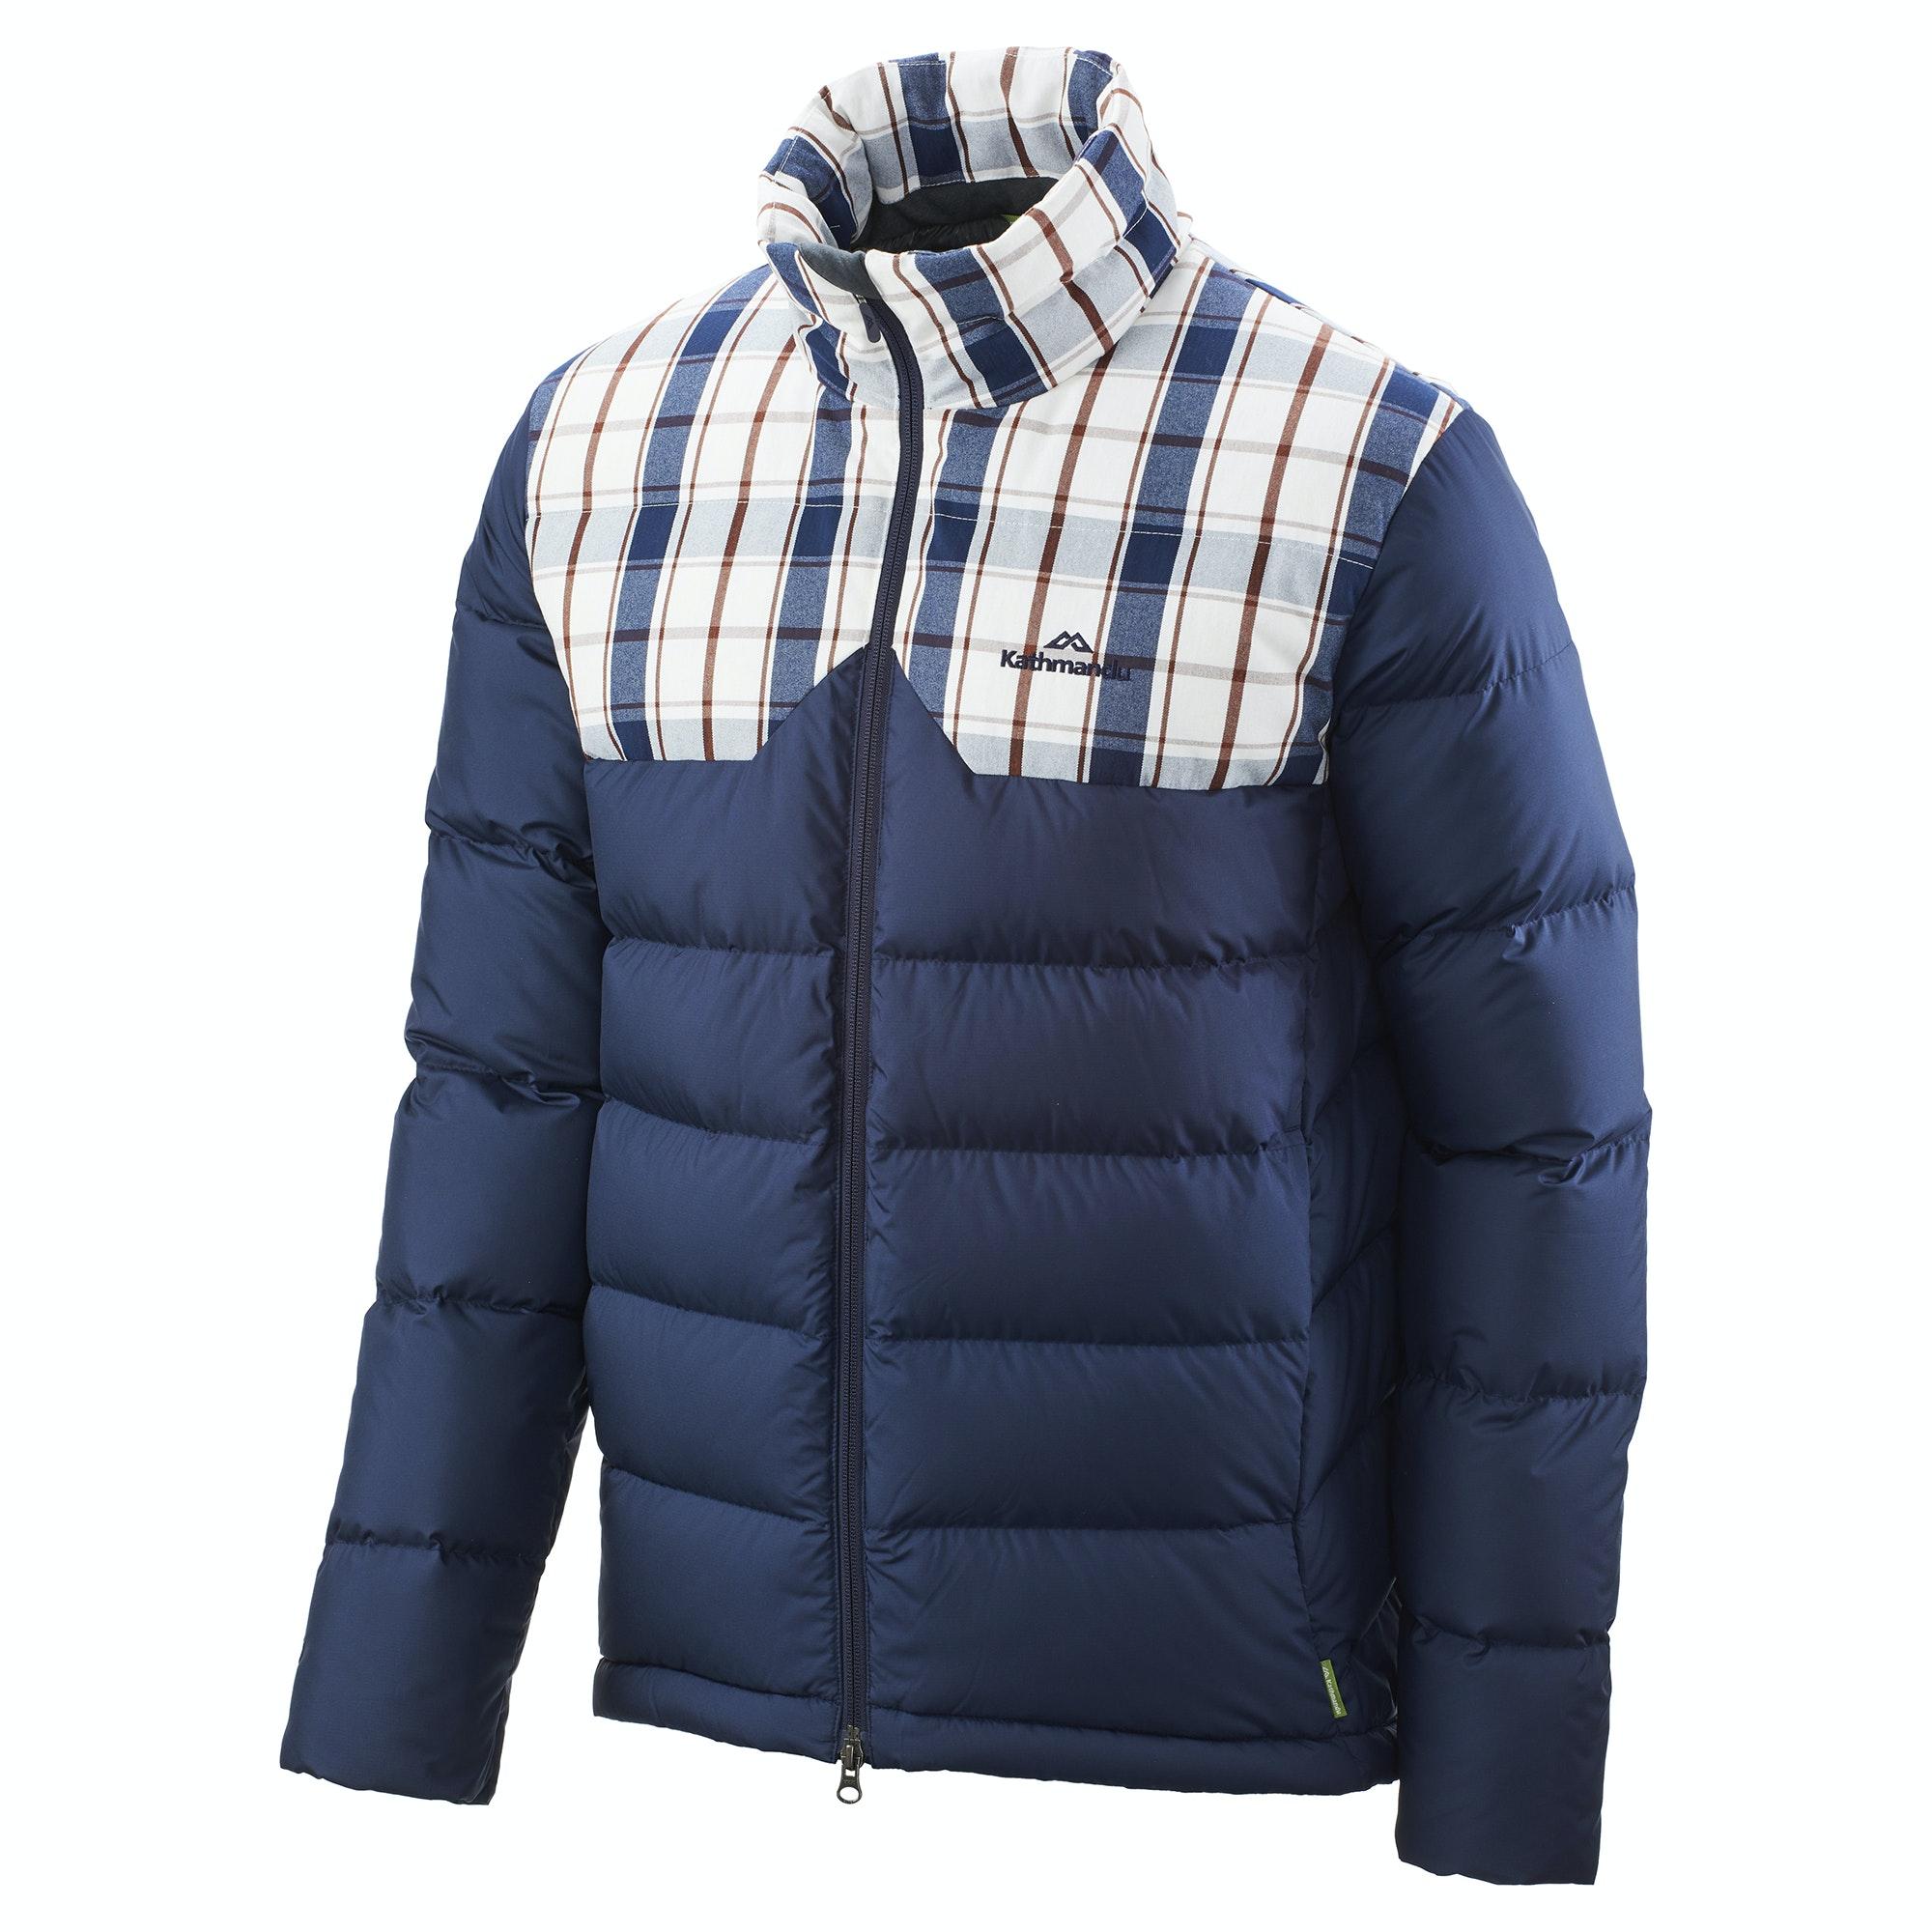 Details about NEW Kathmandu Epiq Men's Warm Winter Duck Down Puffer Jacket v2